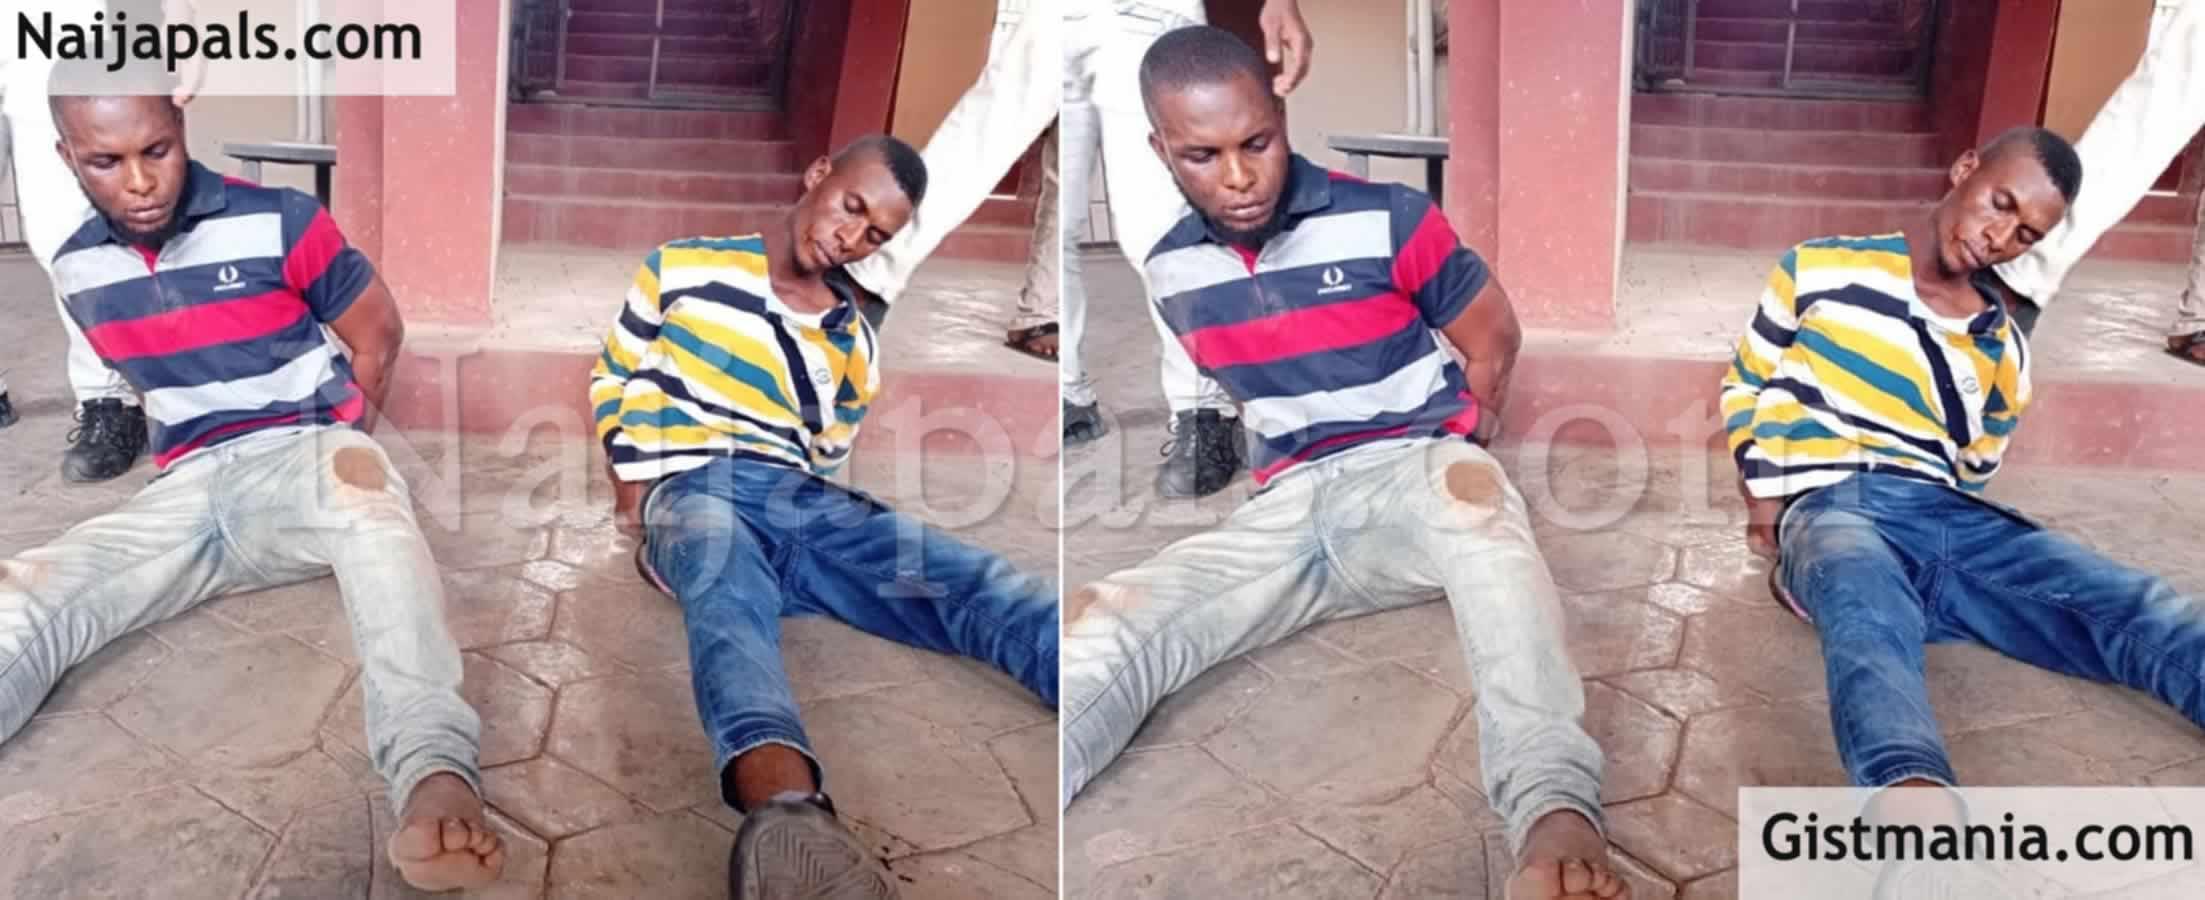 <img alt='.' class='lazyload' data-src='https://img.gistmania.com/emot/news.gif' /> <b>Ondo State Police Arrest Two Brothers, Segun & Azeez Adeoye For Killing A Student, Seun Akinsiku</b>